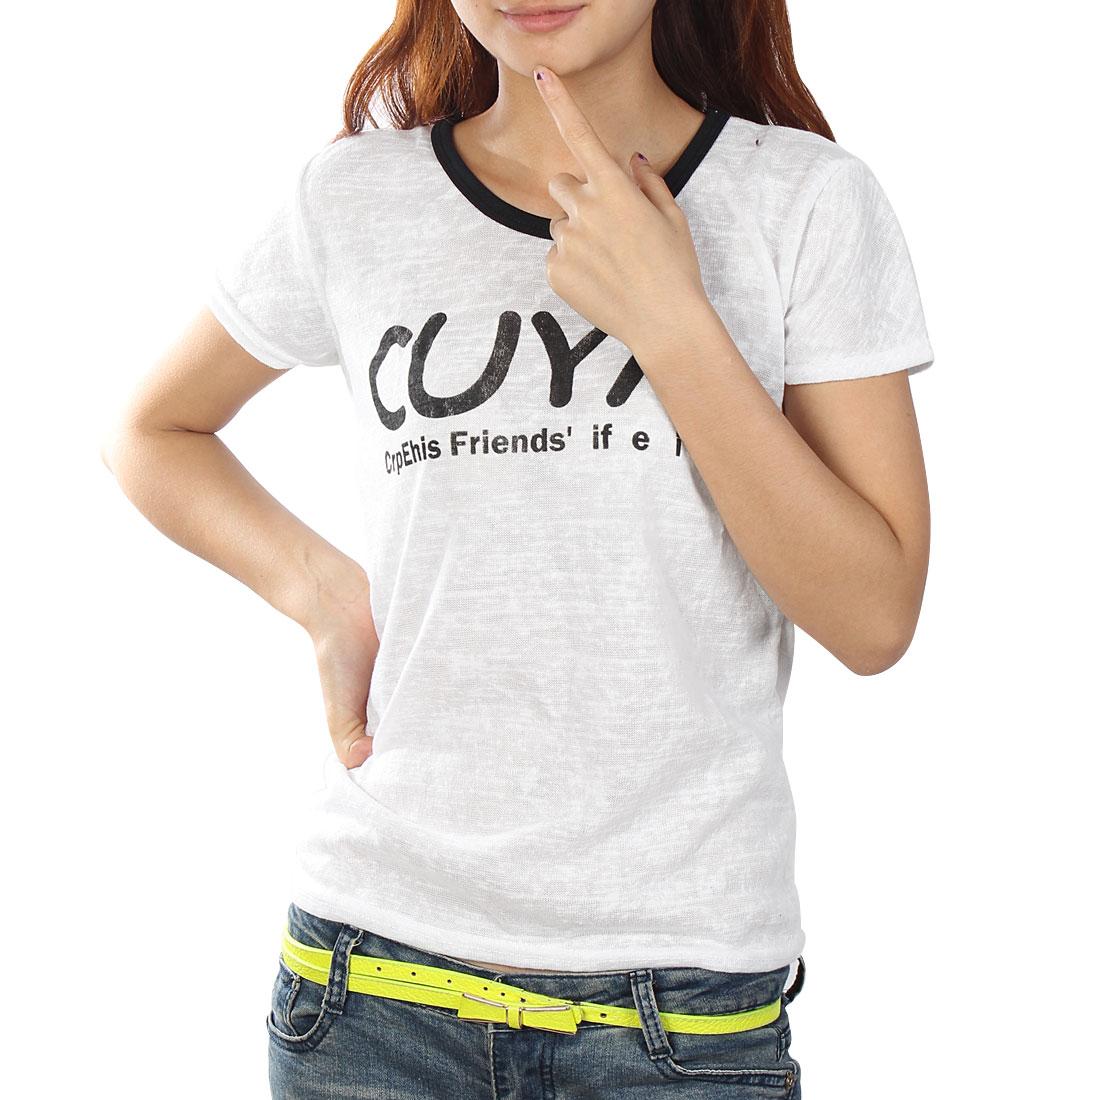 Leisure Round Neck T-Shirt Black White XS for Women